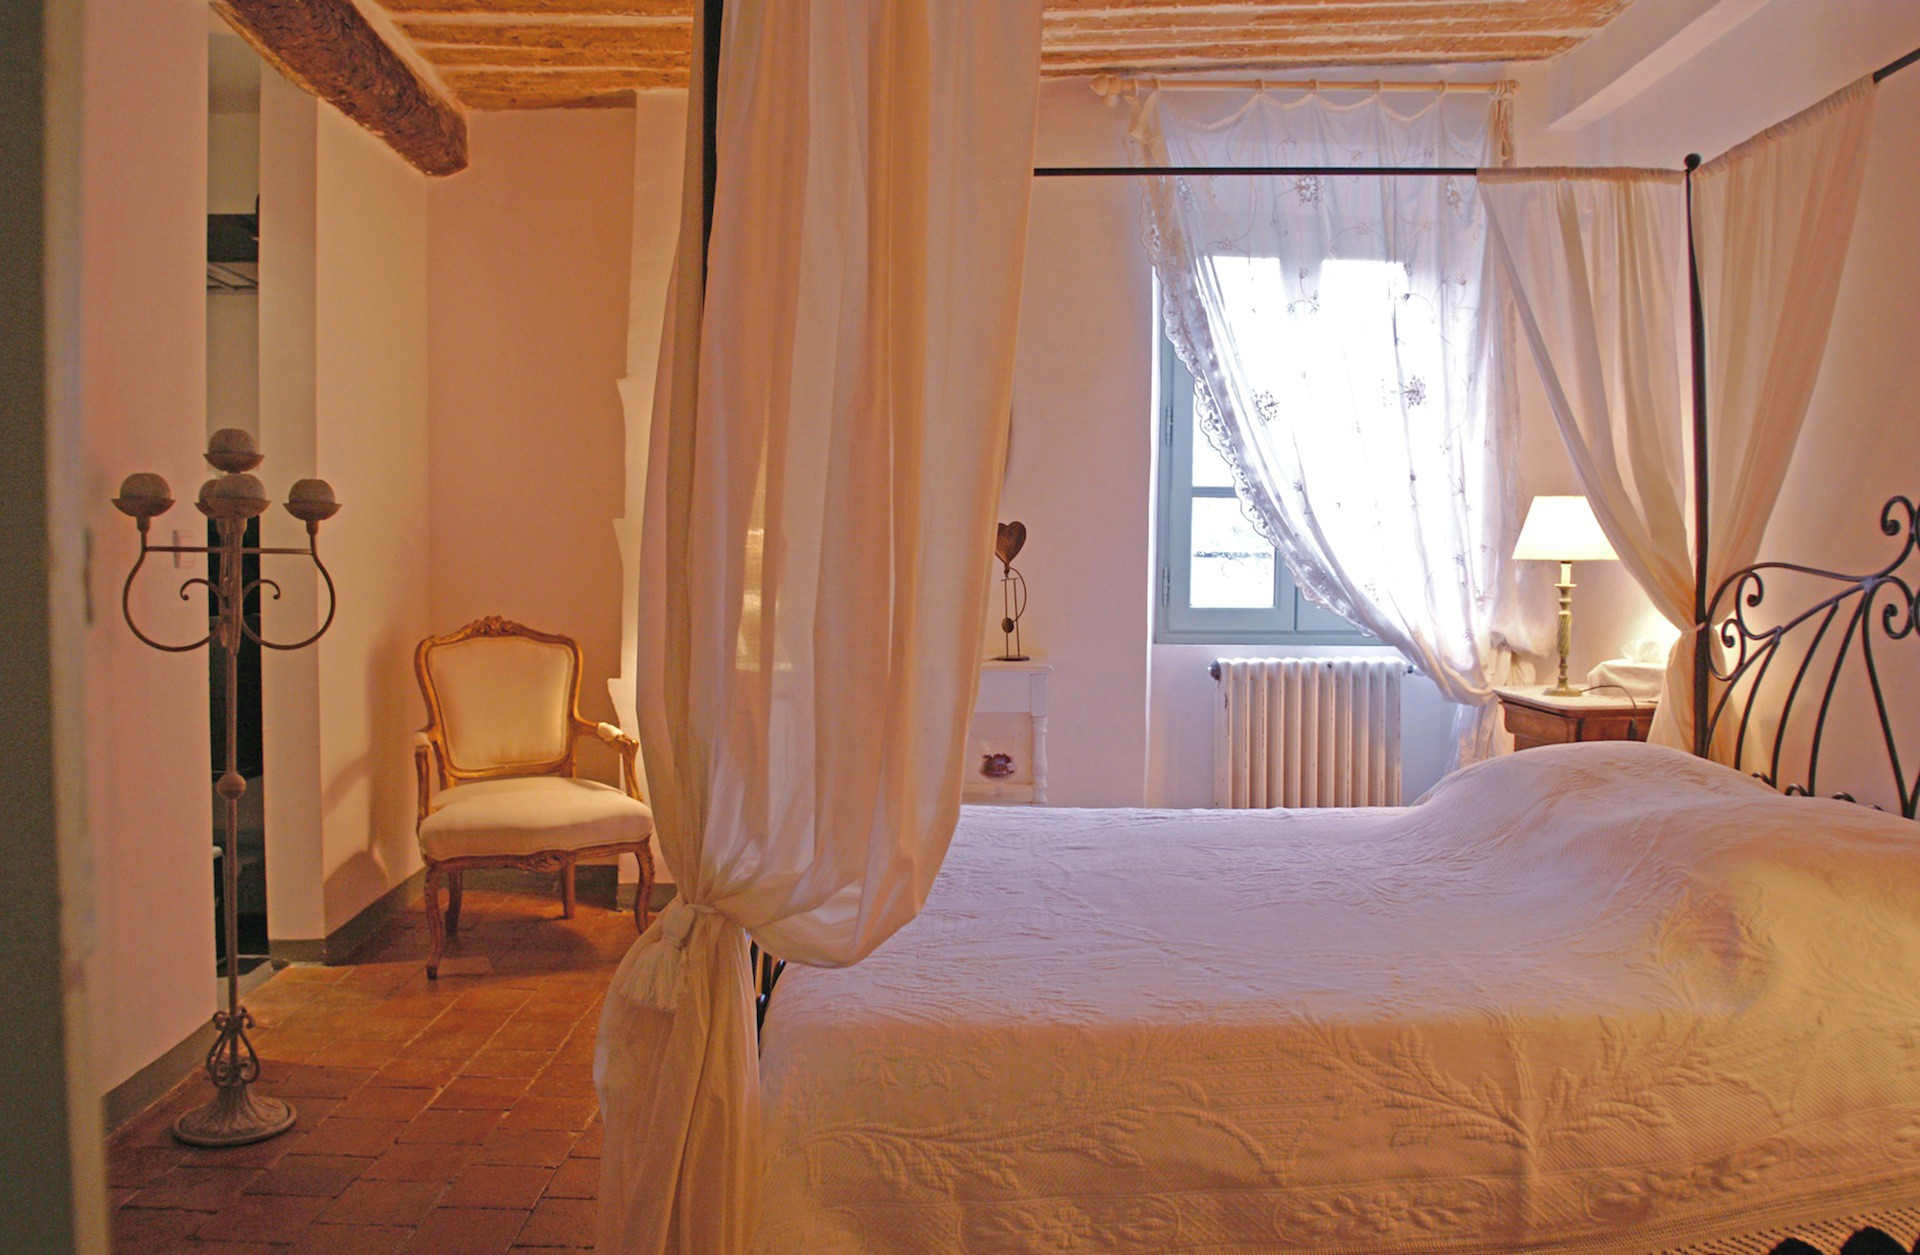 Villa Nassalia Hotel - room photo 11335426